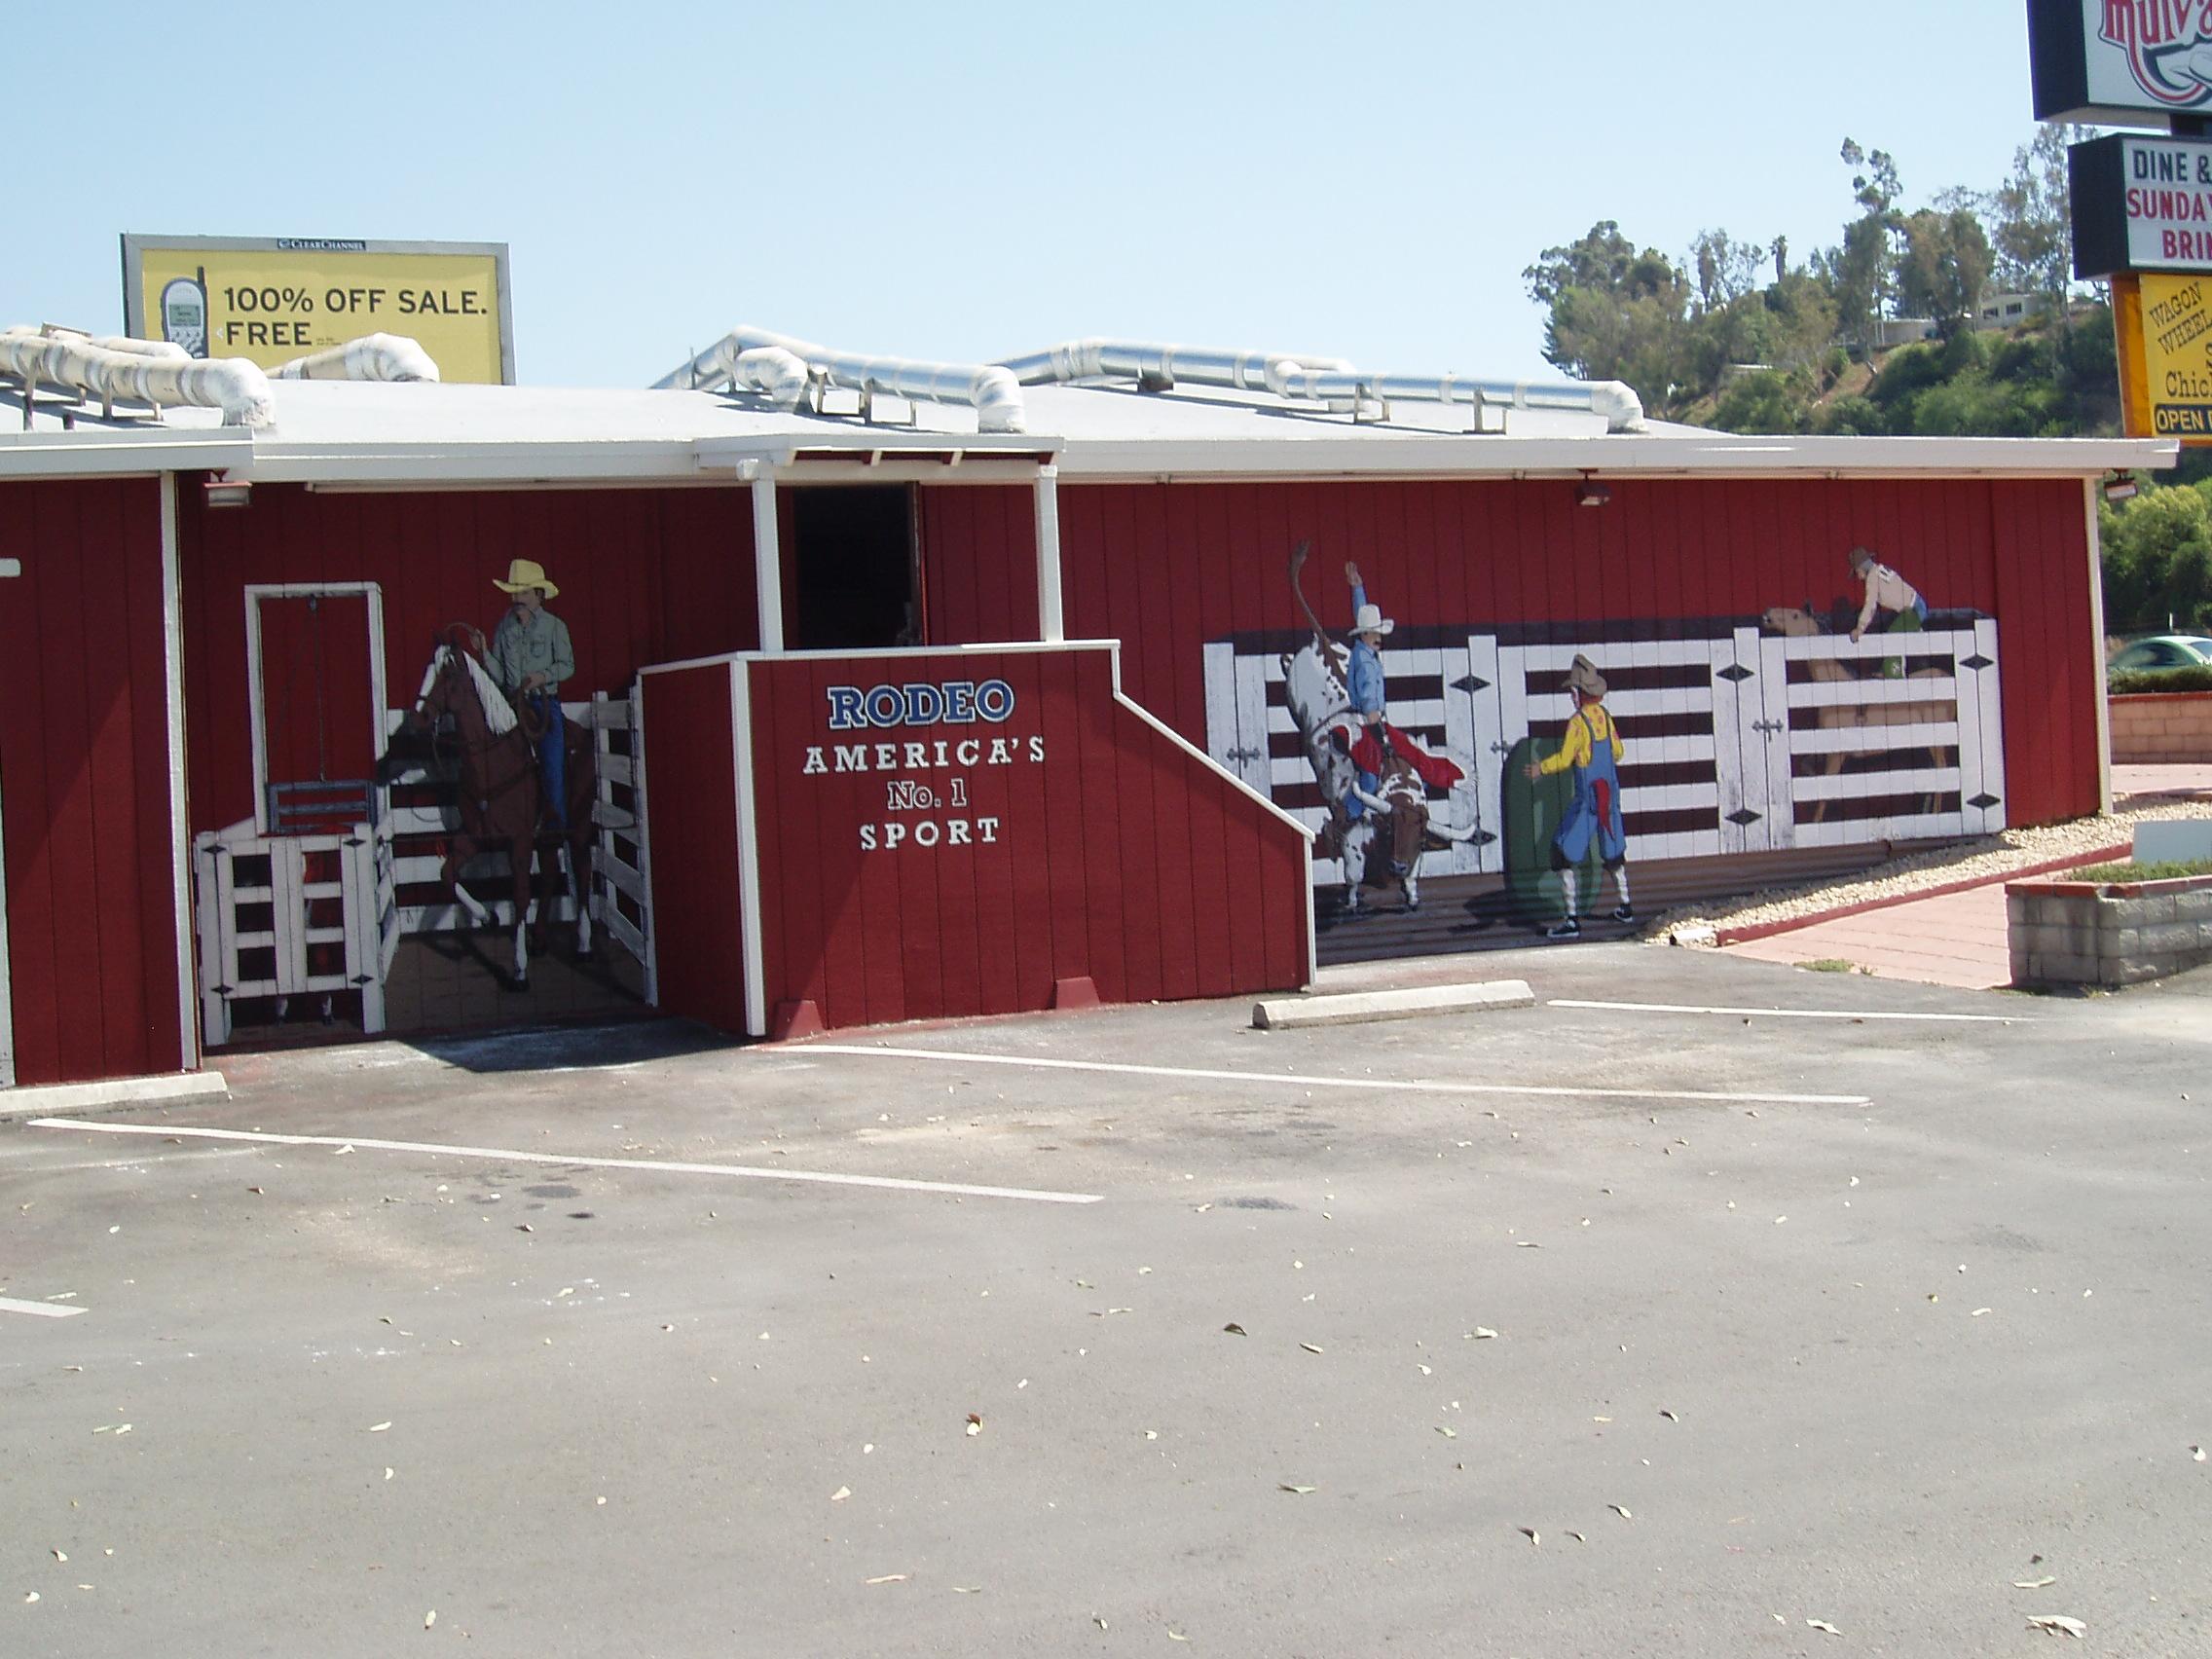 Western Mural Wagon Wheel Restaurant exterior Santee California 8.JPG